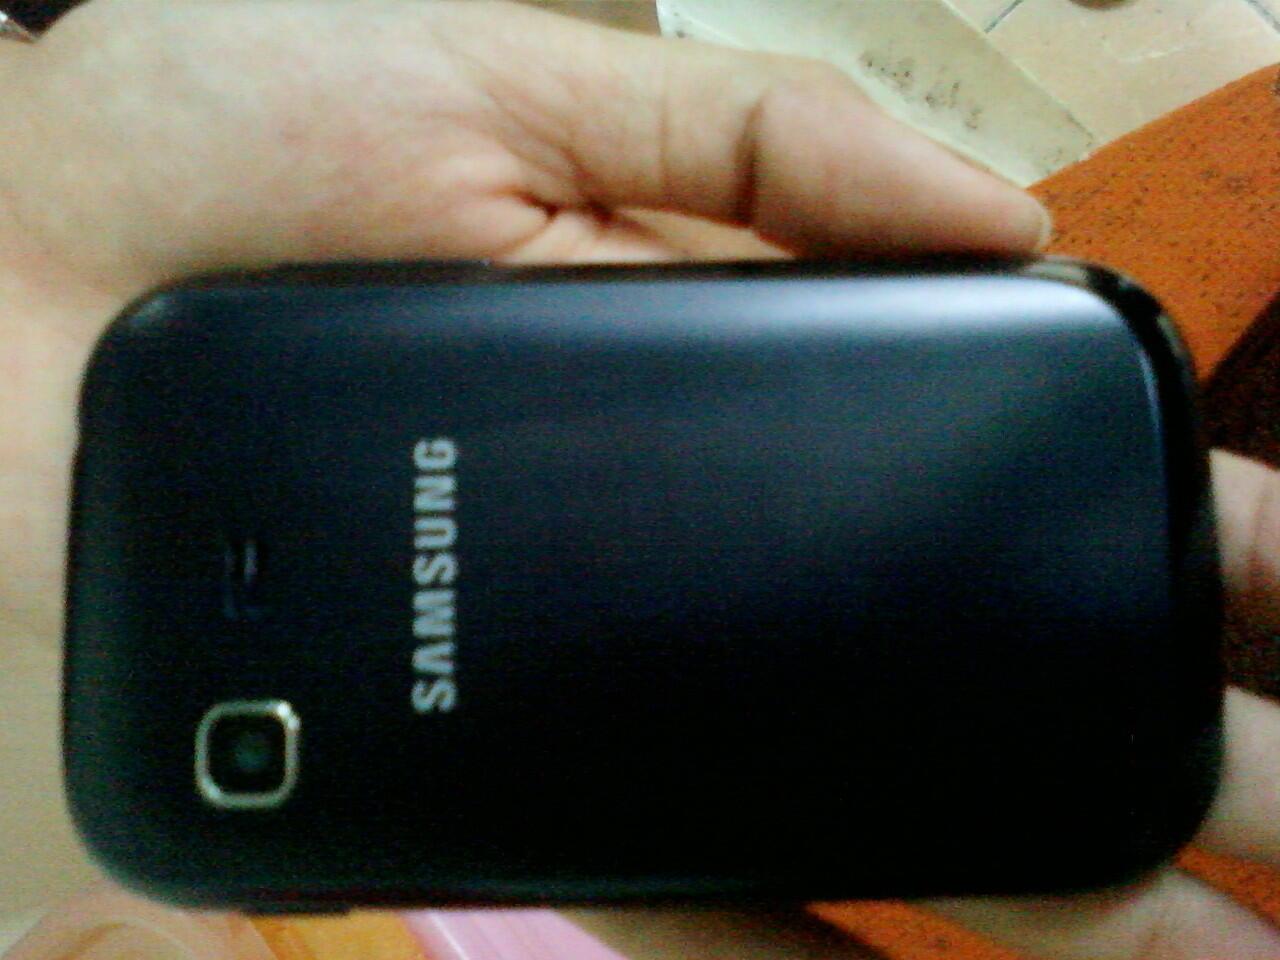 Samsung Galaxy Pocket GT-S5300